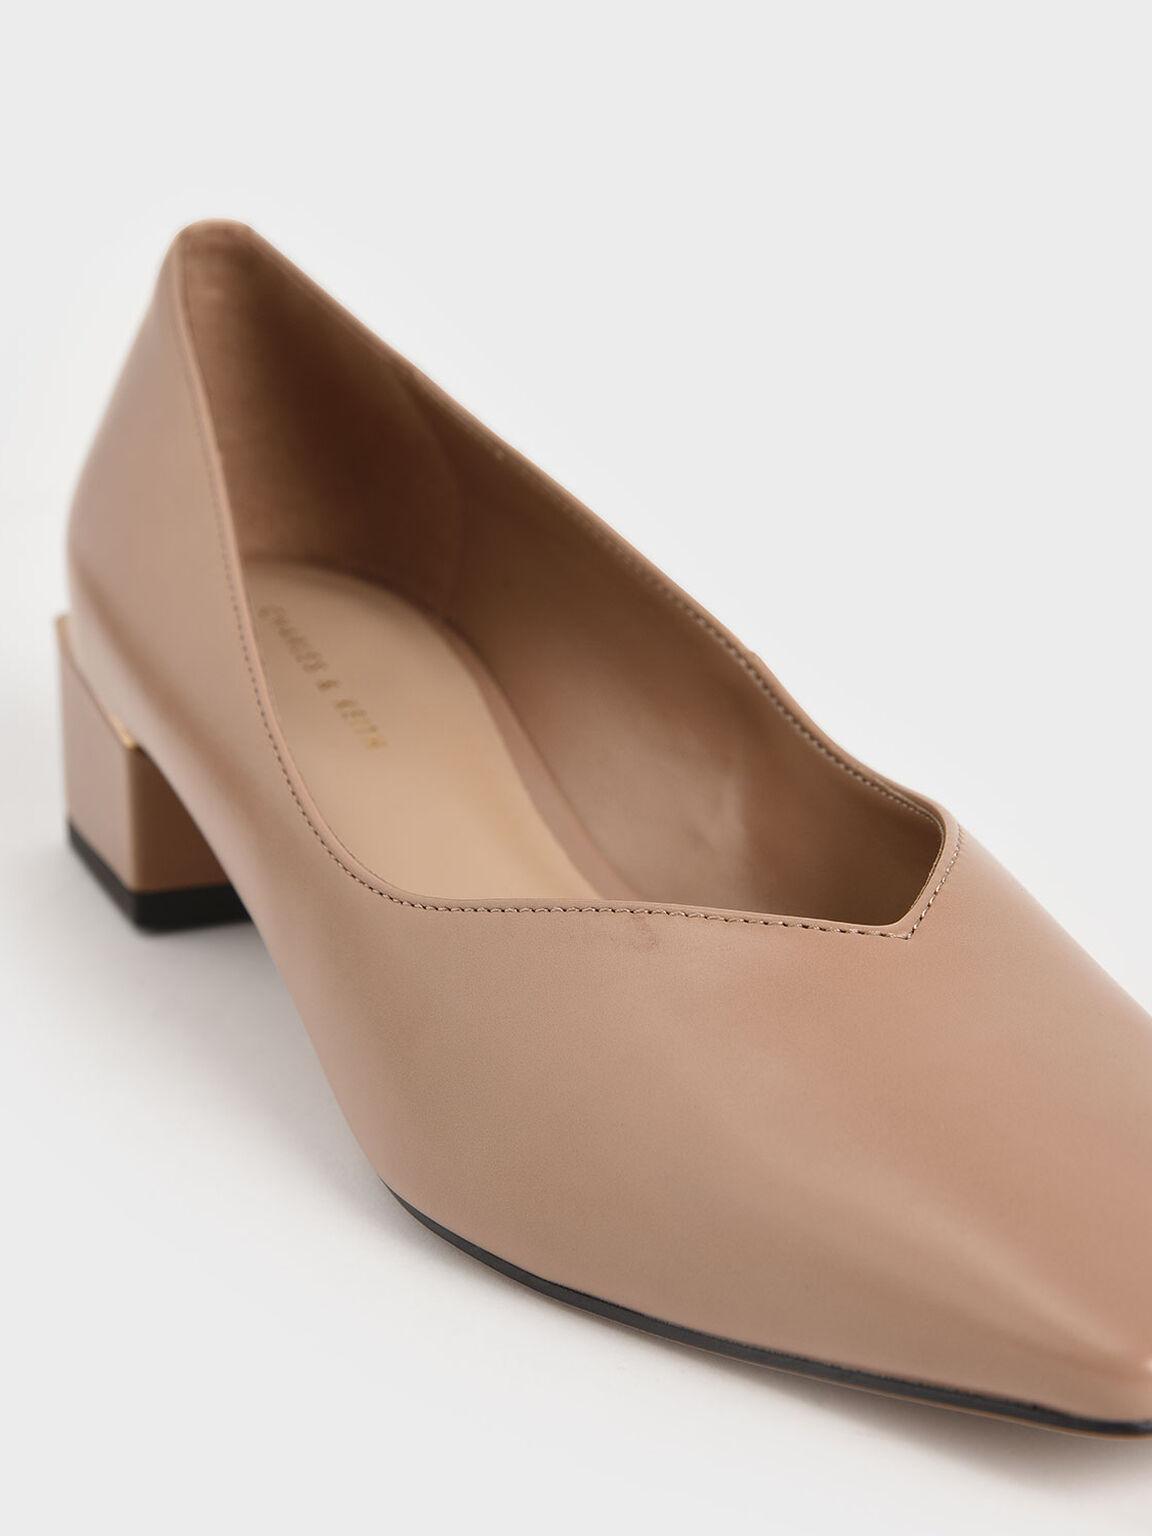 Sepatu Block Heel Pumps, Nude, hi-res